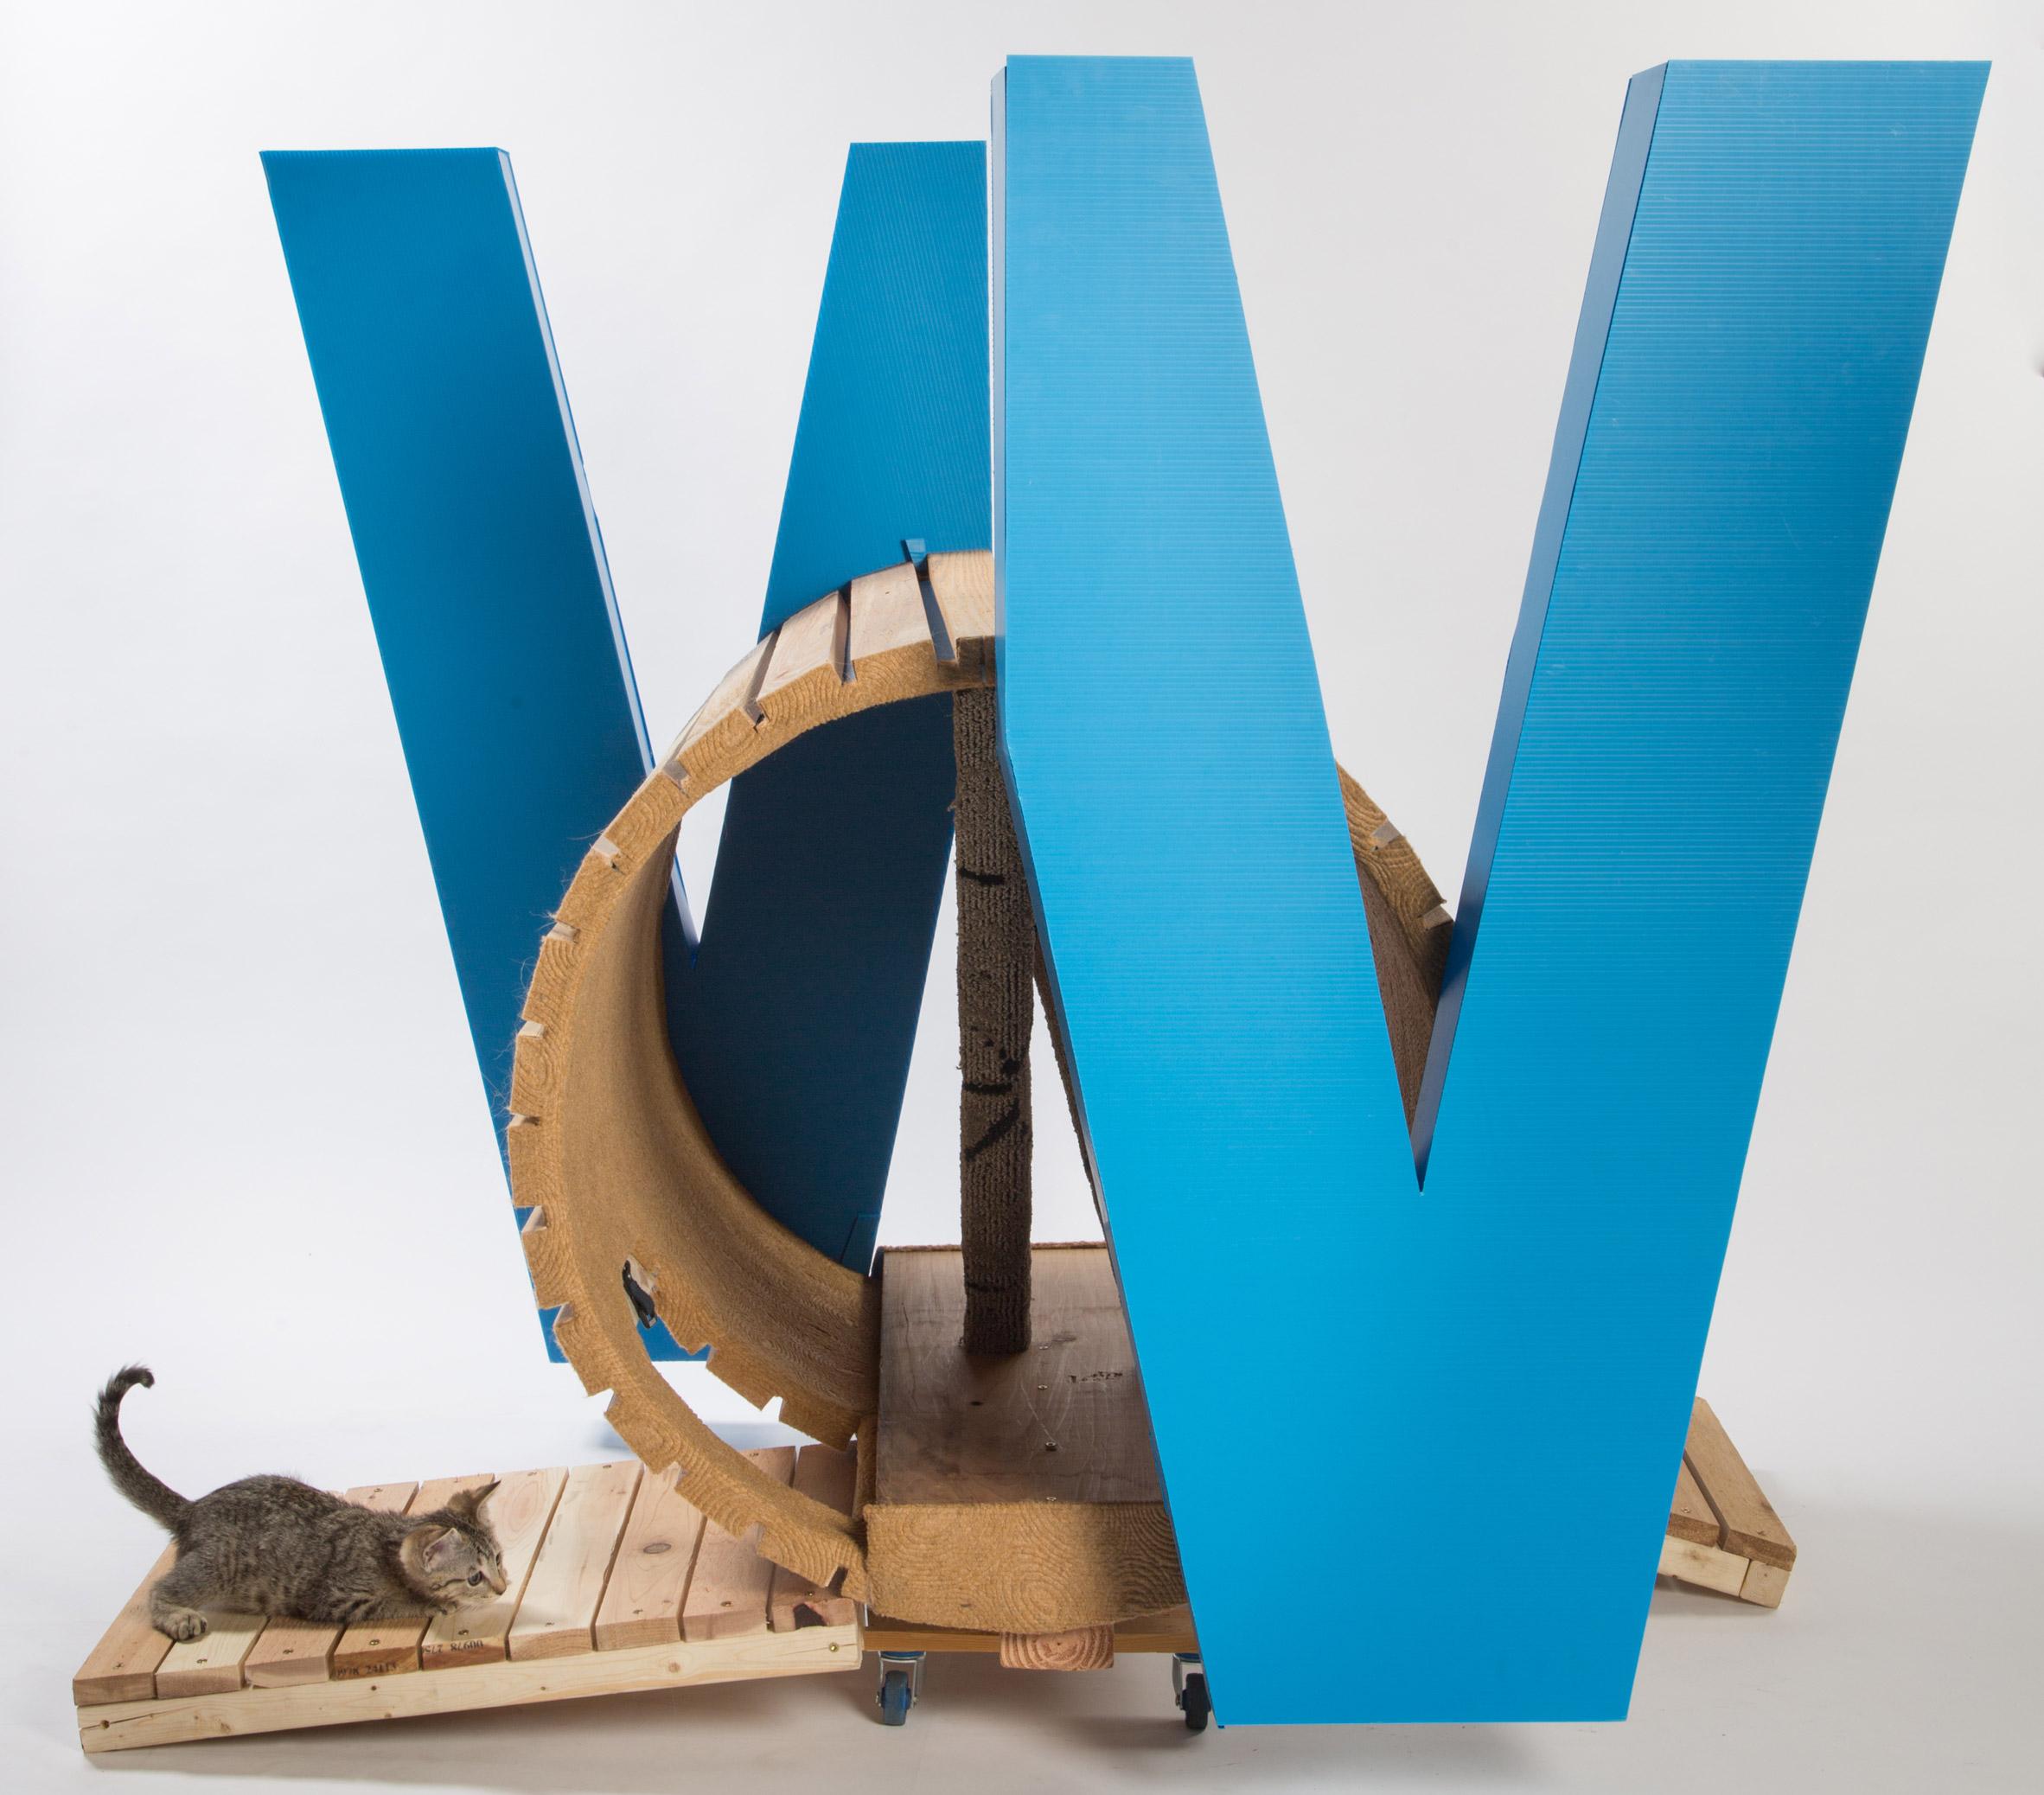 Cat's Win! Cat's Win! by Kollin Altomare Architects